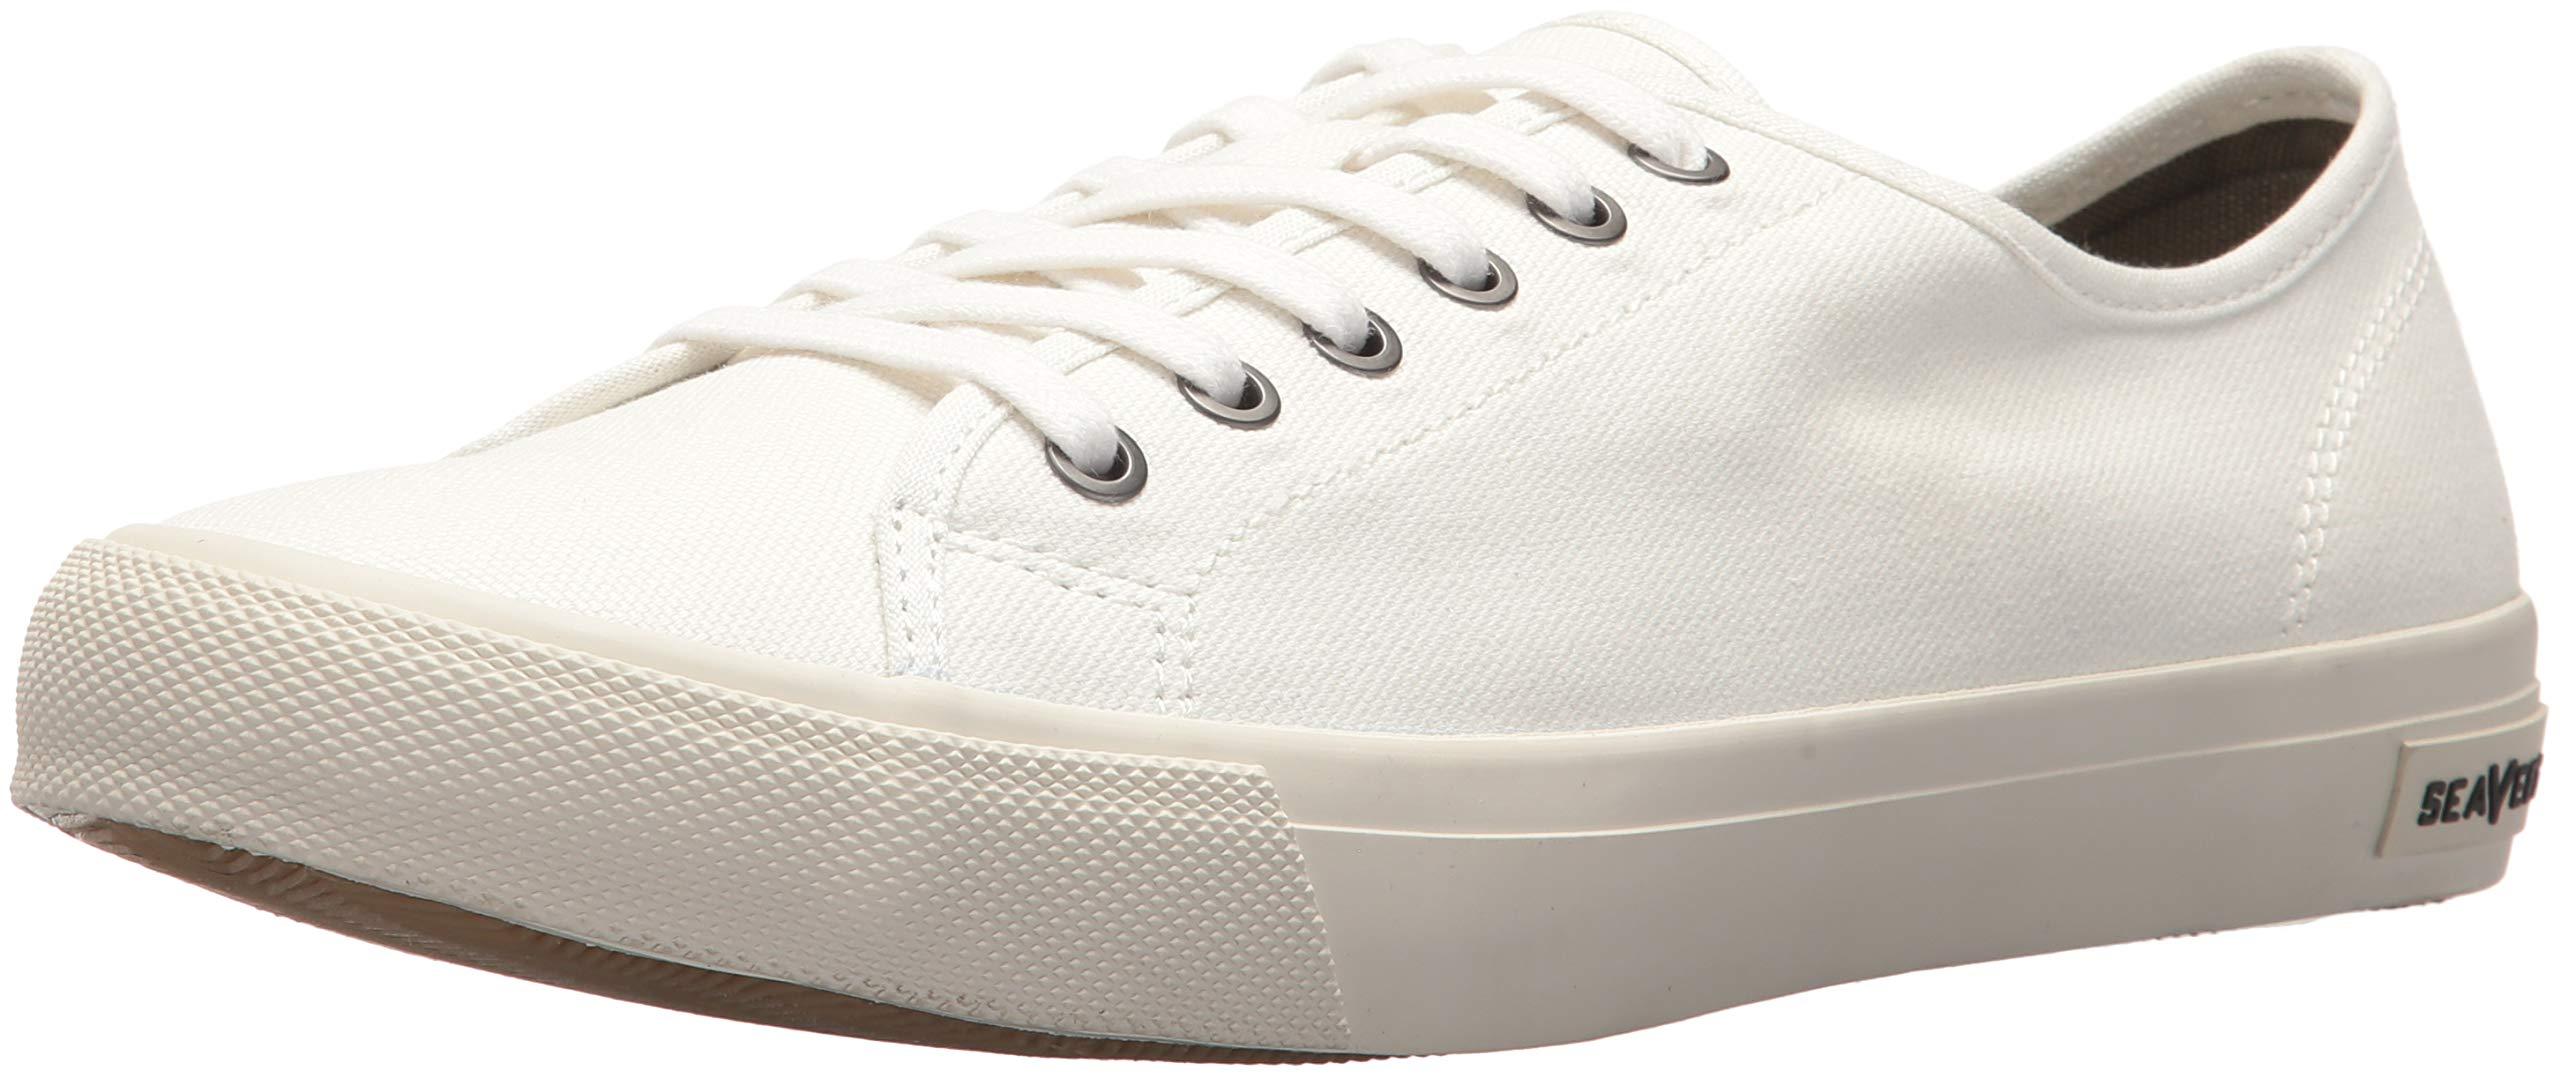 SeaVees Men's Monterey Standard Sneaker, White, 10.5 M US